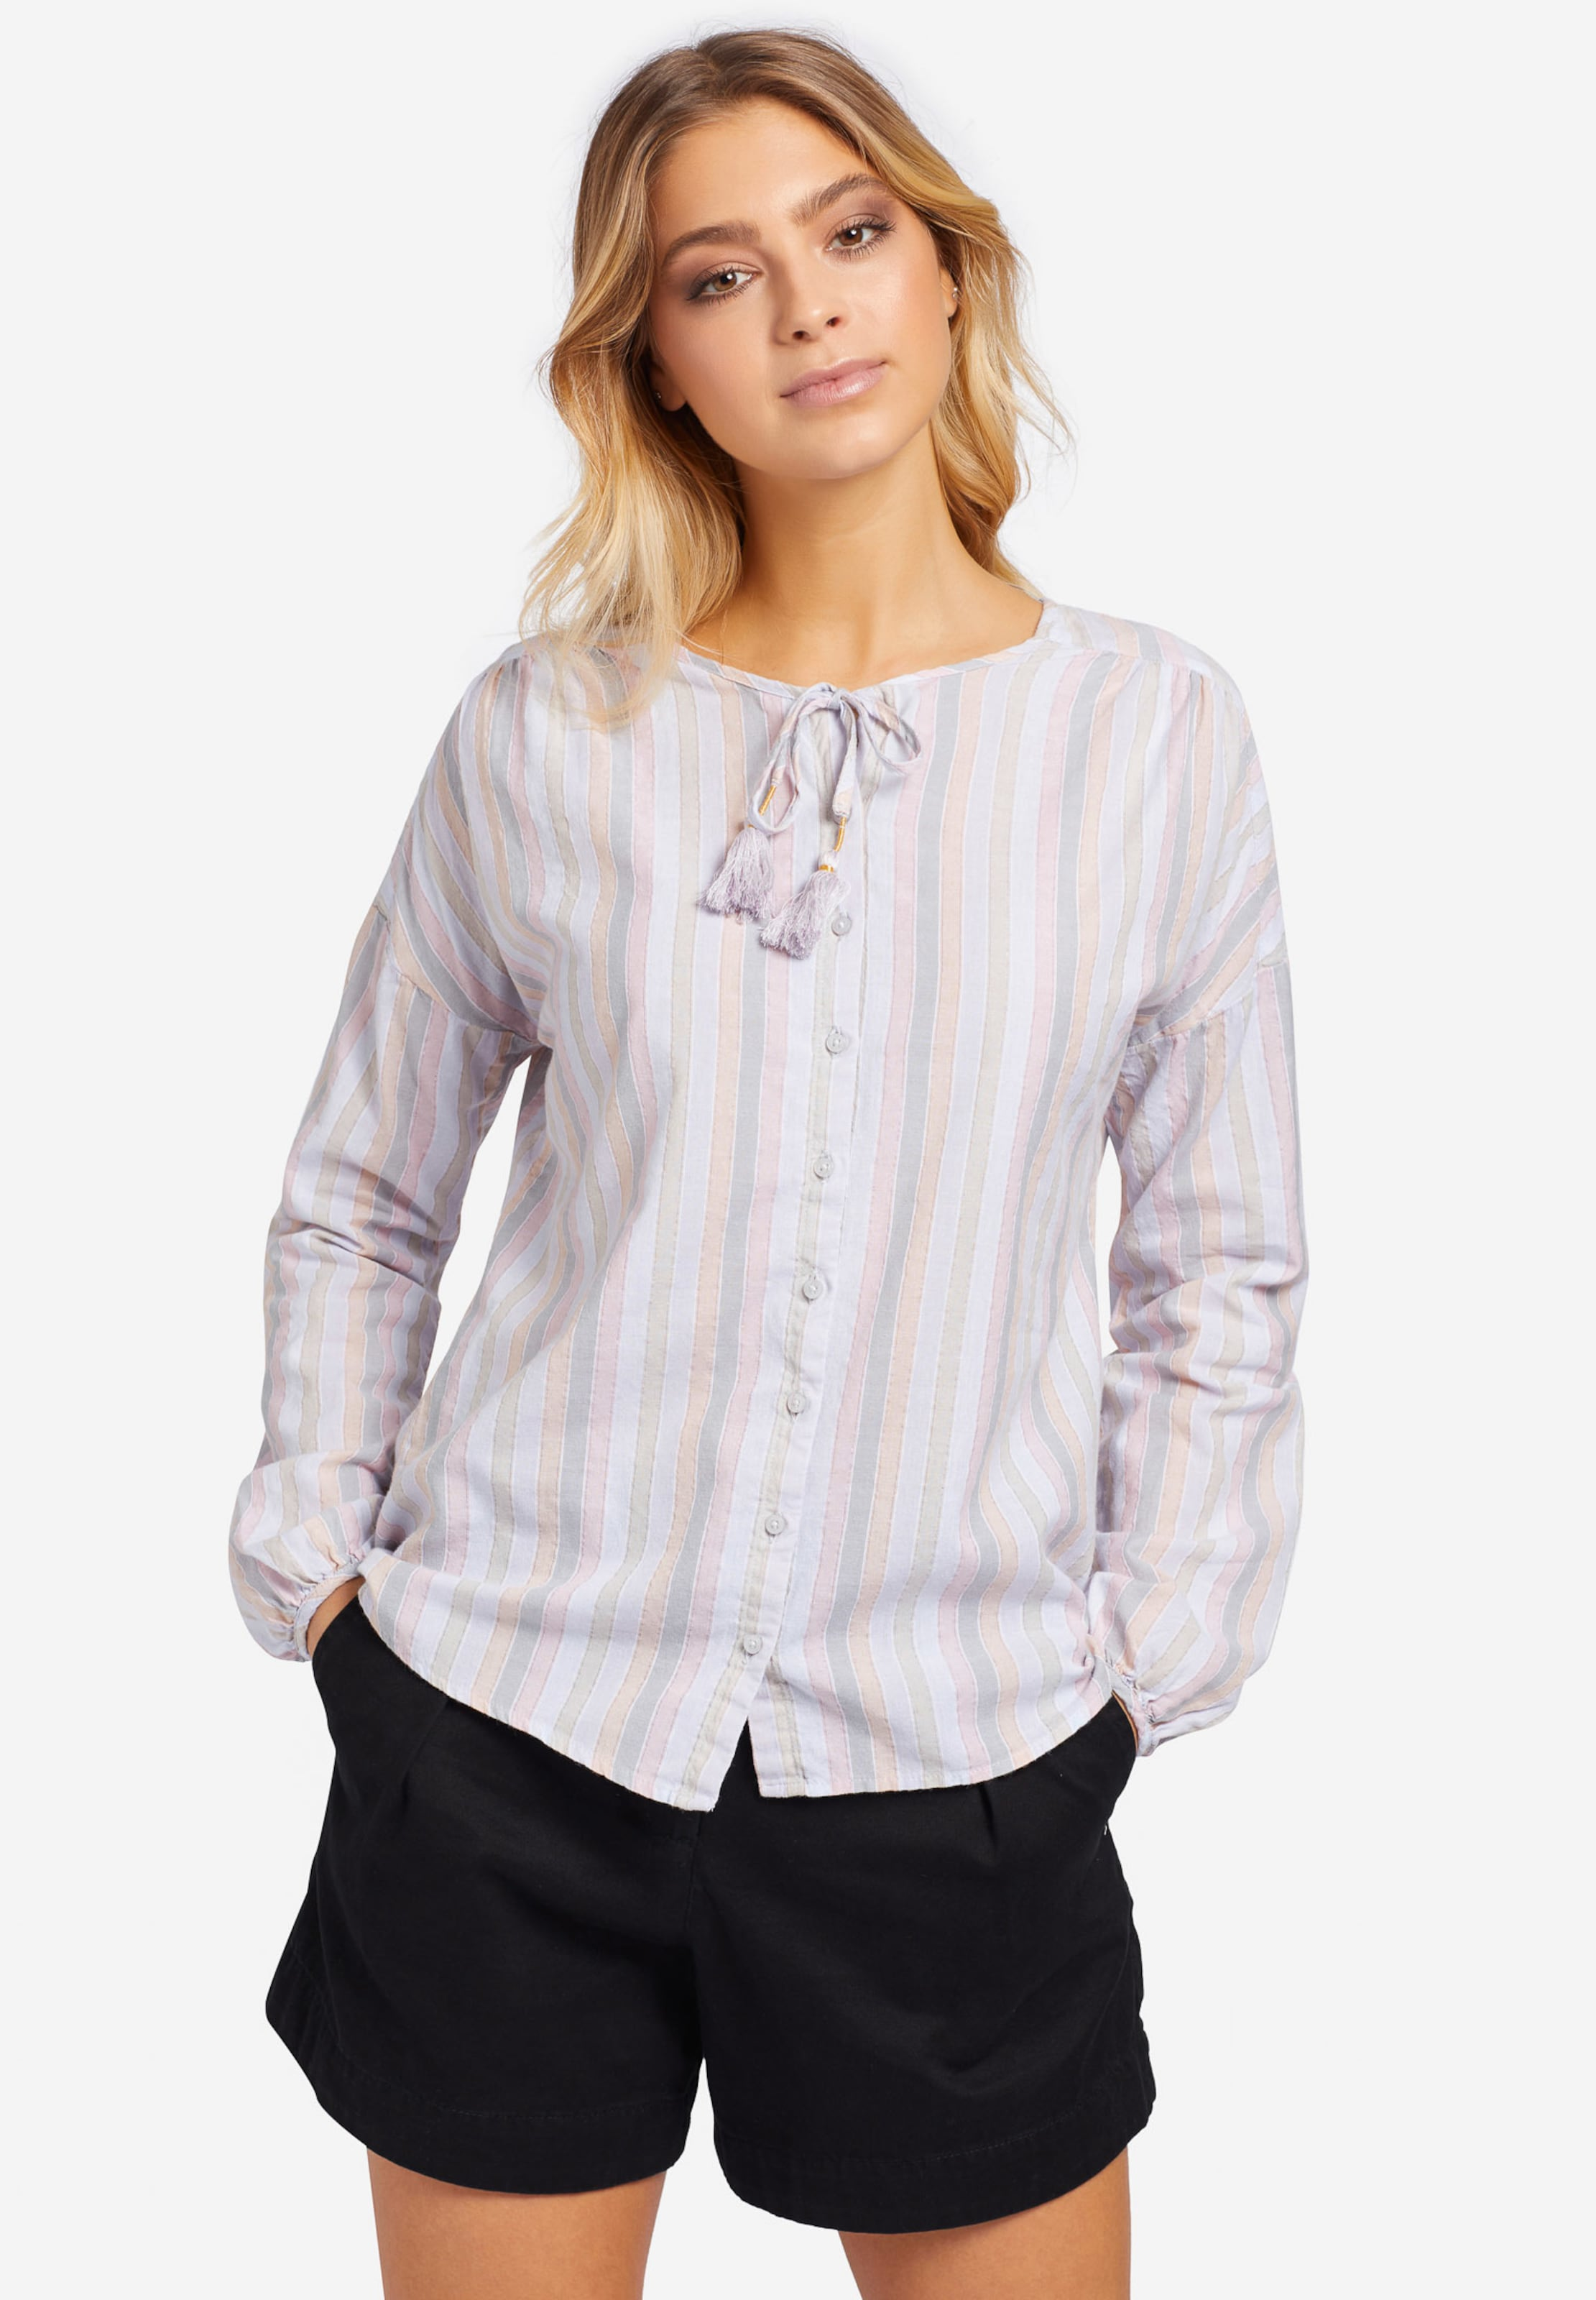 Khujo Pastellpink In Bluse PastellgrünPastelllila 'angele' Pastellorange AjL54R